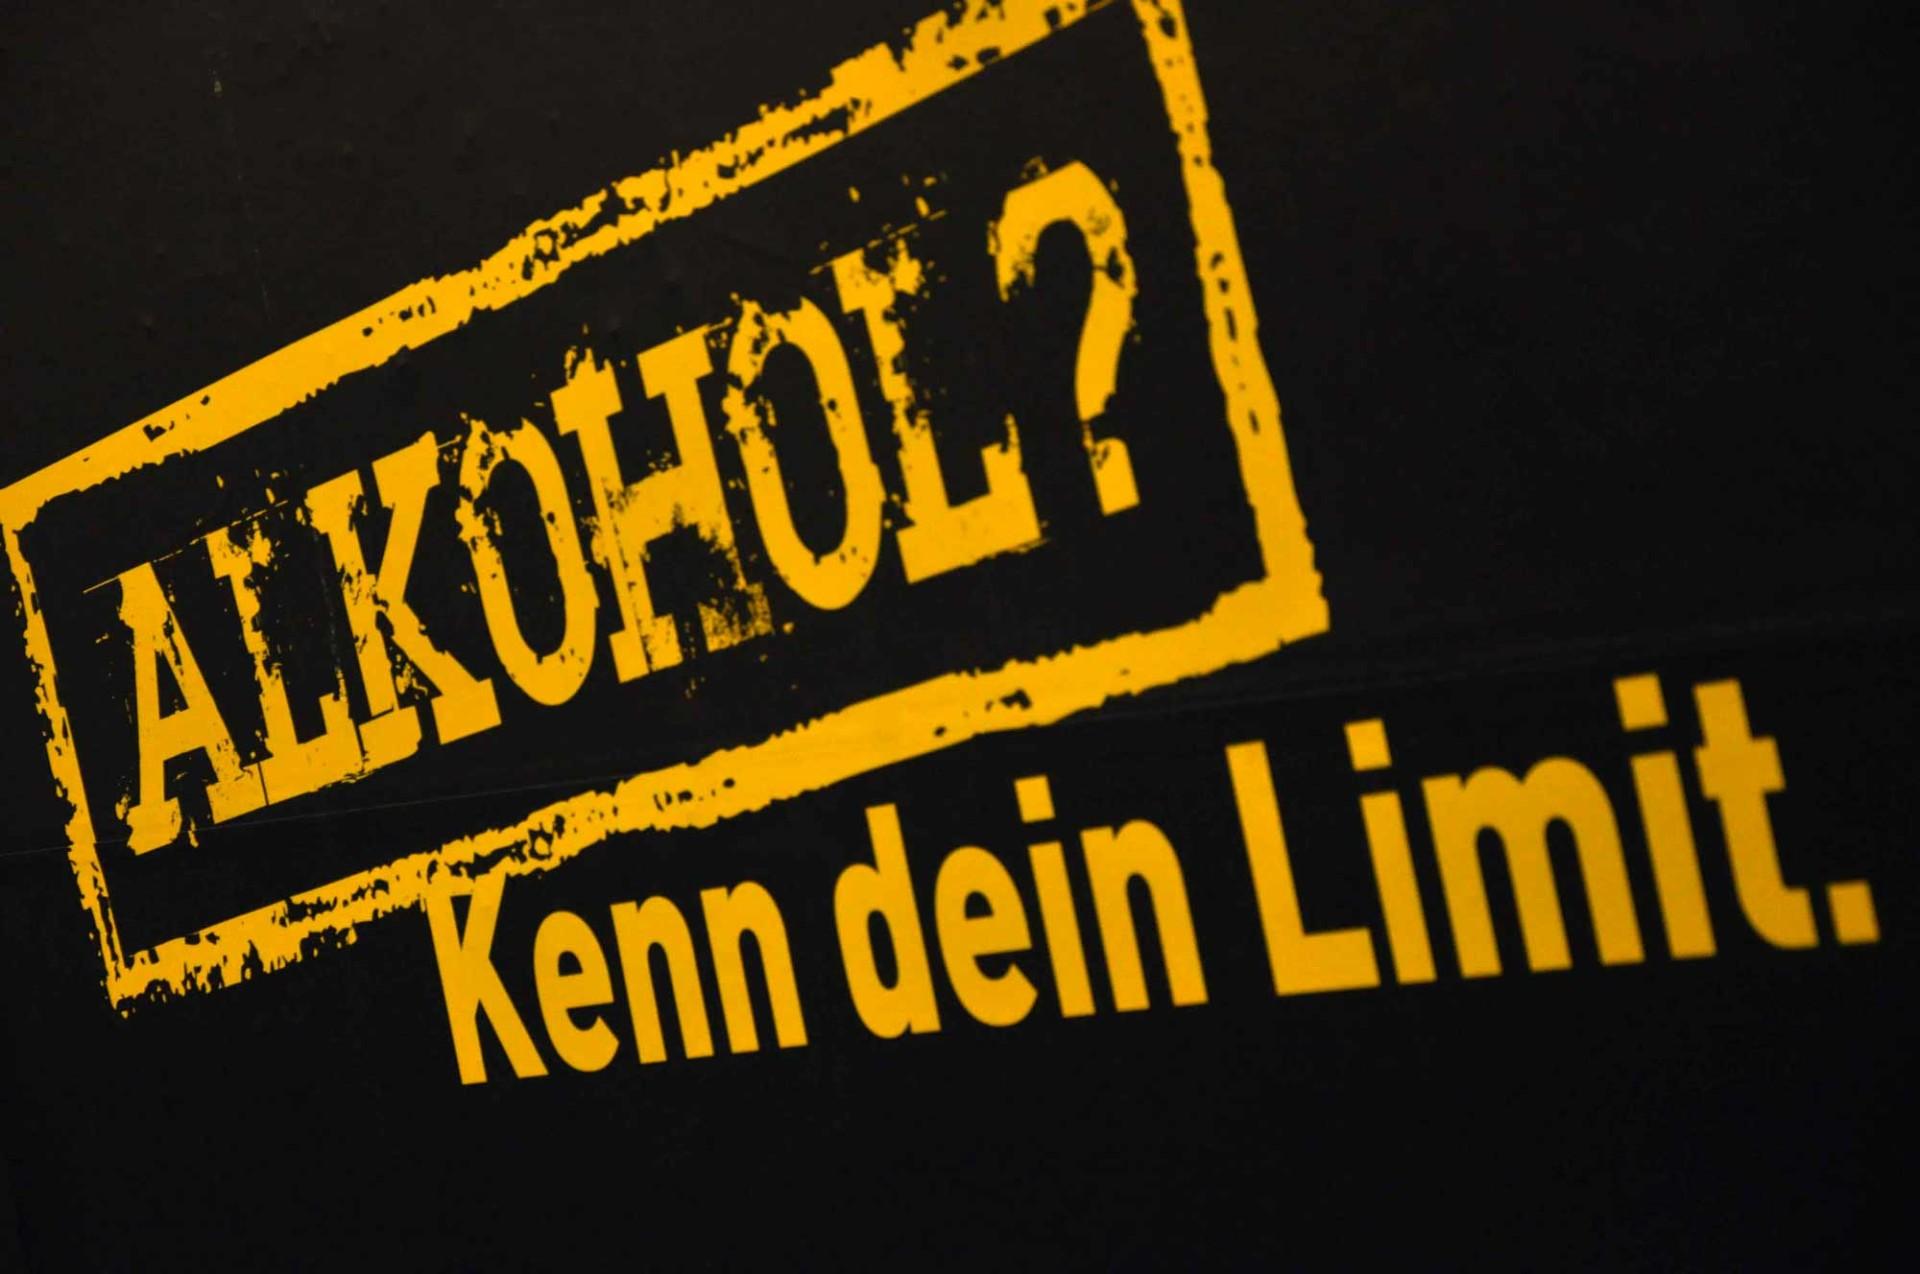 Alkohol? Kenn dein limit?